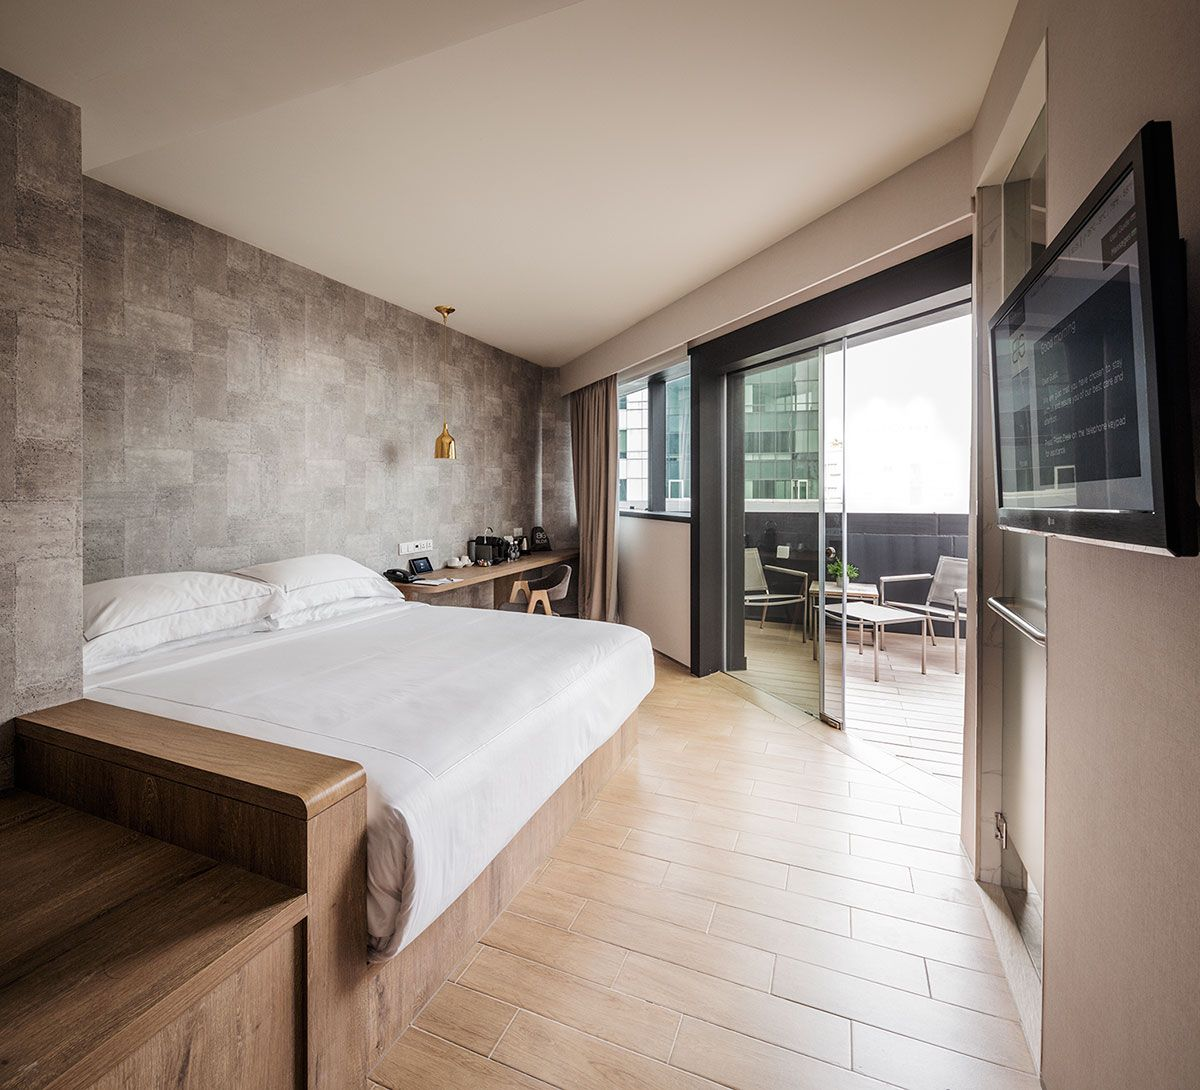 Hotel Bedroom Designs: Singapore: BIG Hotel Interior. Neutral And Cool Tones